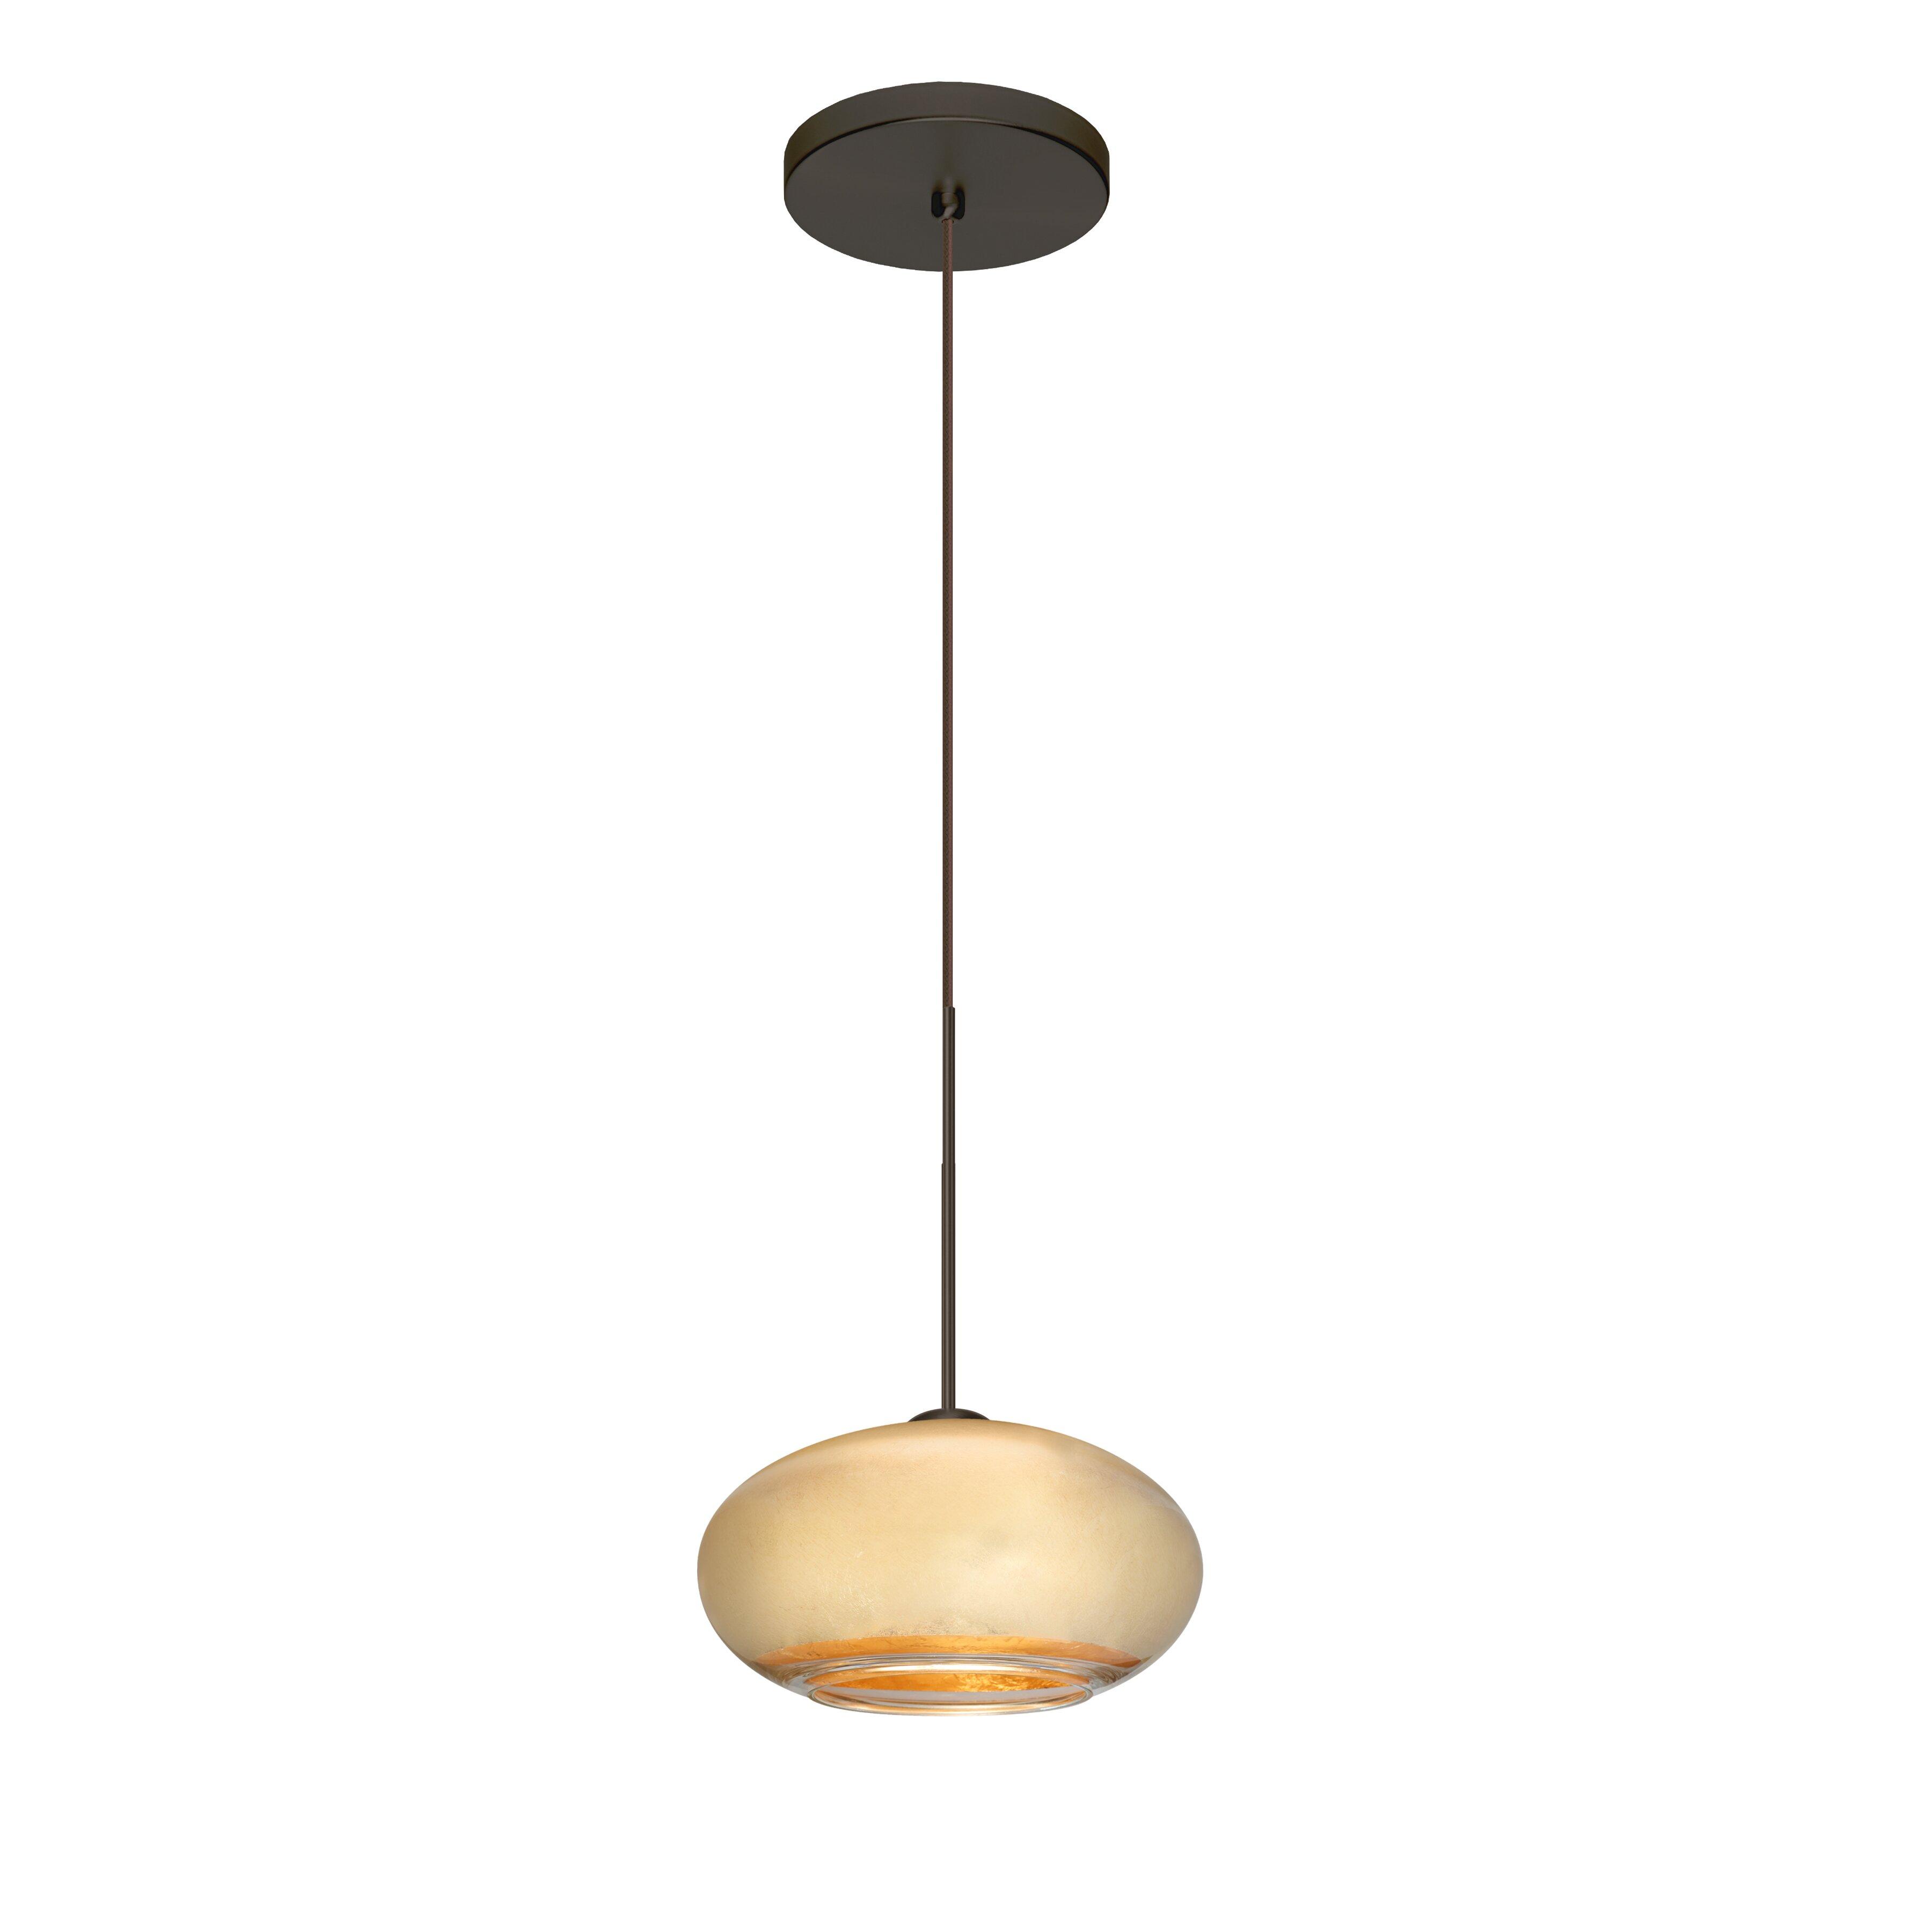 Besa Lighting Brio 1 Light Globe Pendant | Wayfair